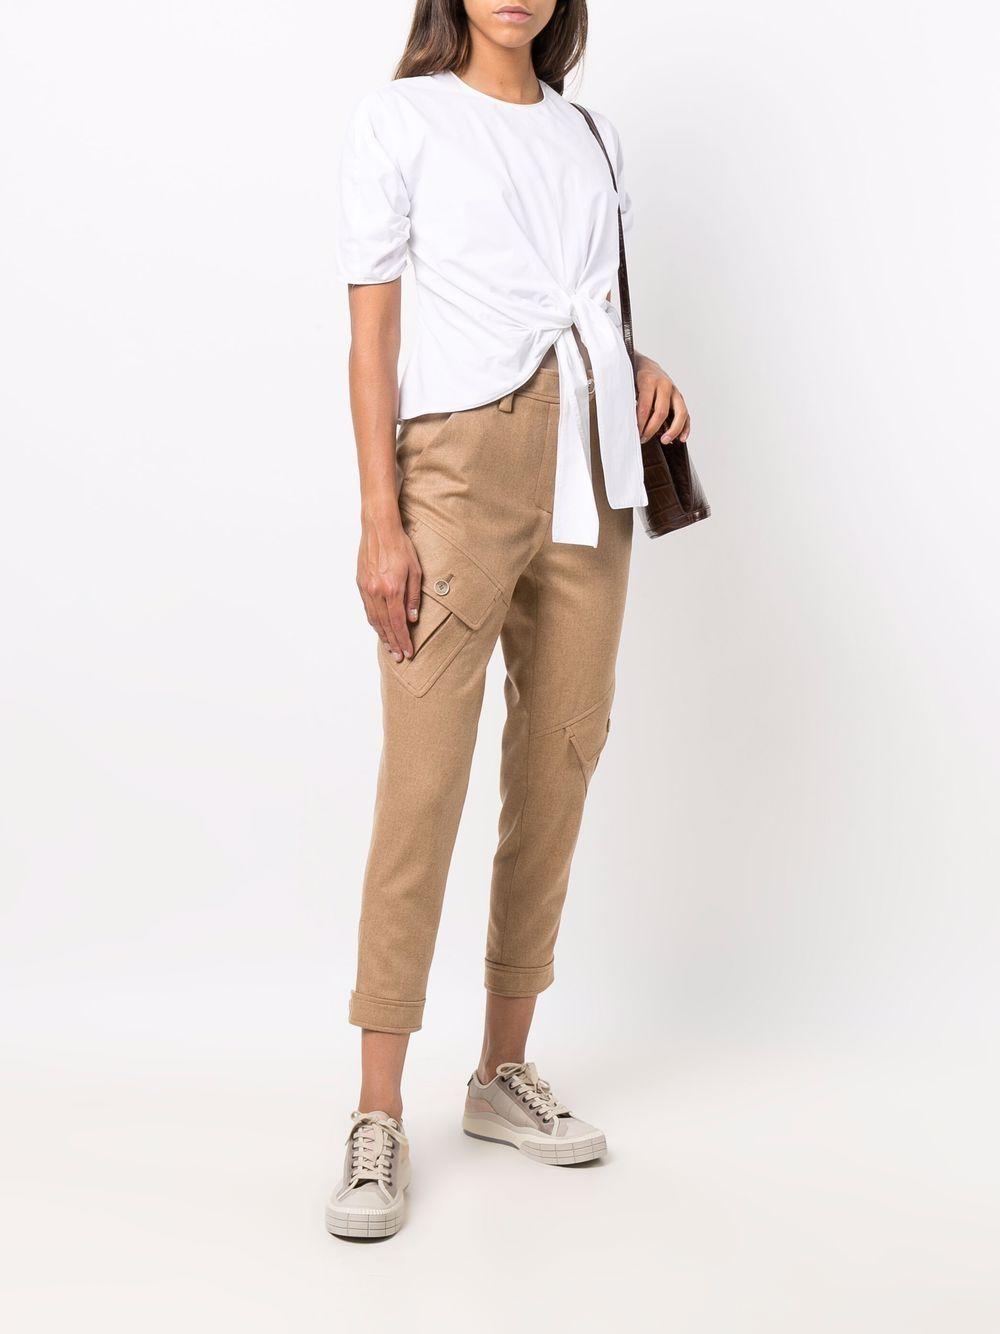 Pantaloni cropped in lana cargo beige cammello e cashmere ELEVENTY | Pantaloni | D80PAND03-TES0B00504